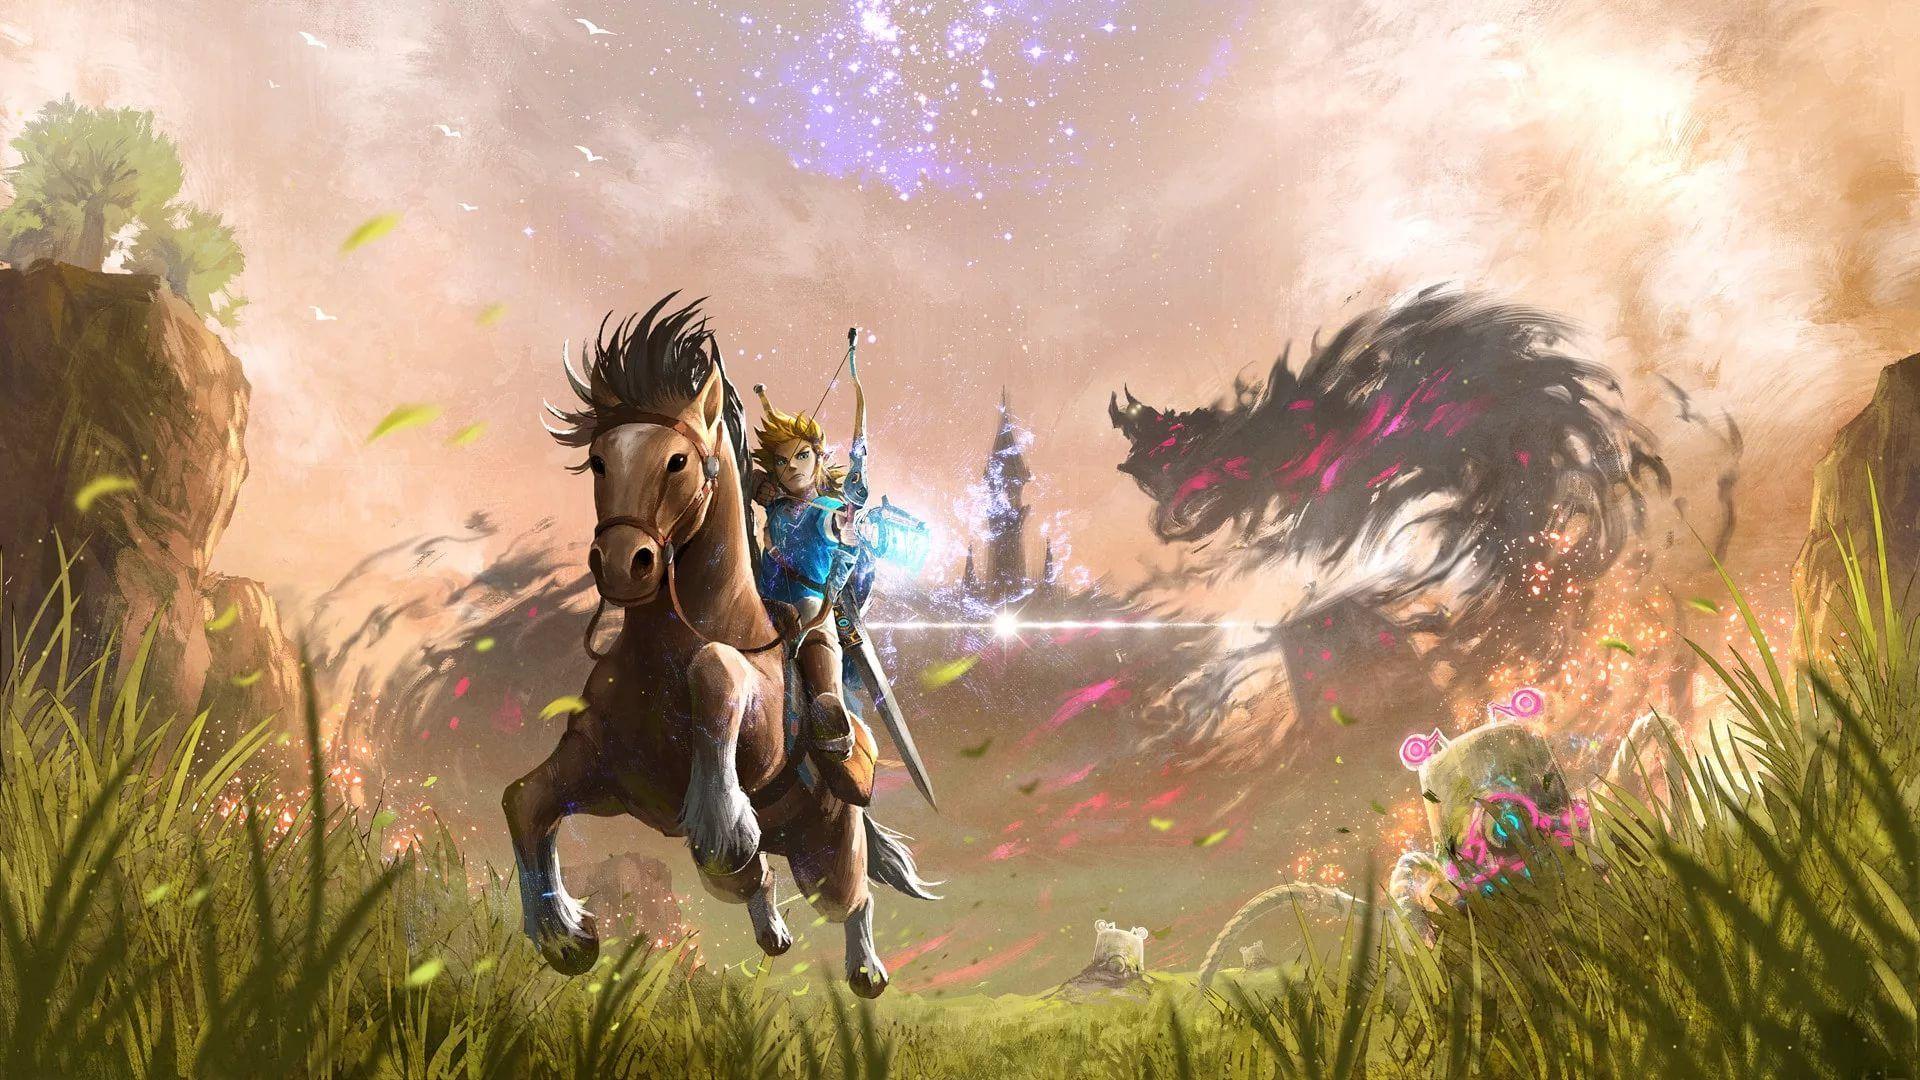 Zelda Live wallpaper photo full hd